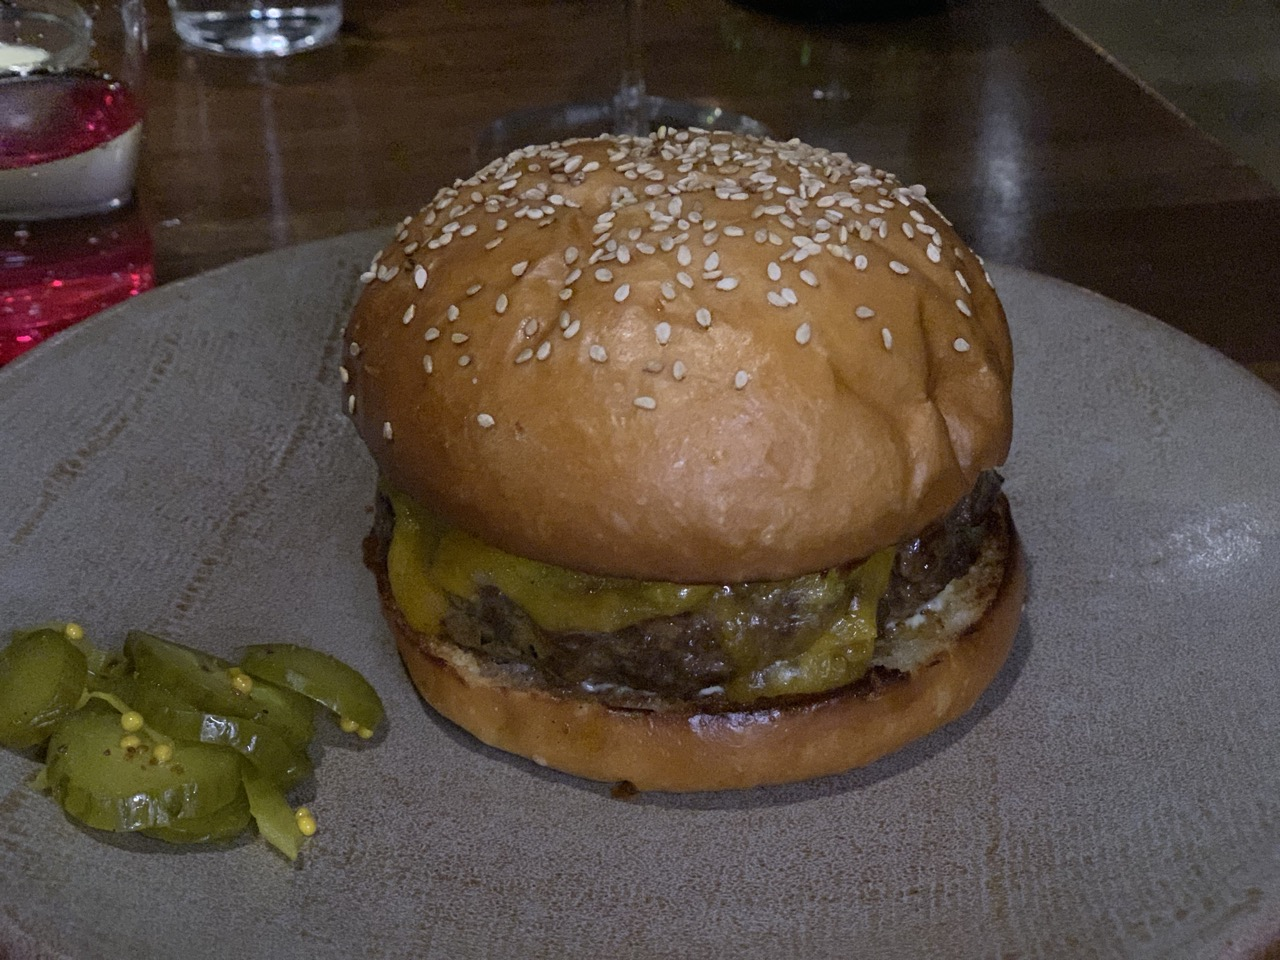 Yummy burger.